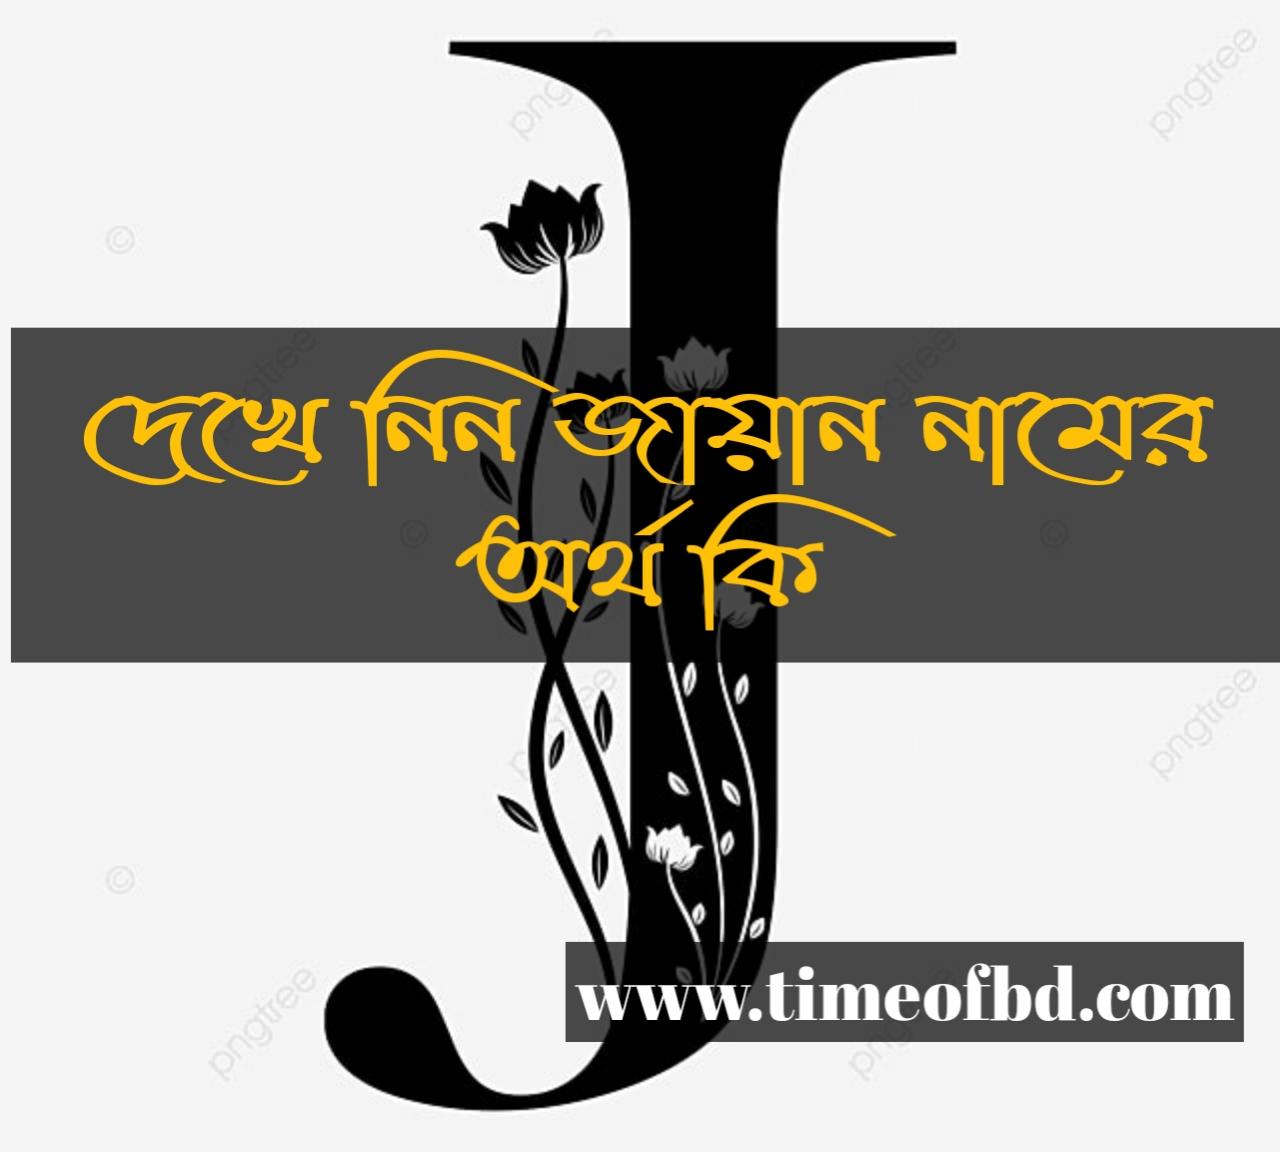 Jayan name meaning in Bengali, জায়ান নামের অর্থ কি, জায়ান নামের বাংলা অর্থ কি, জায়ান নামের ইসলামিক অর্থ কি,